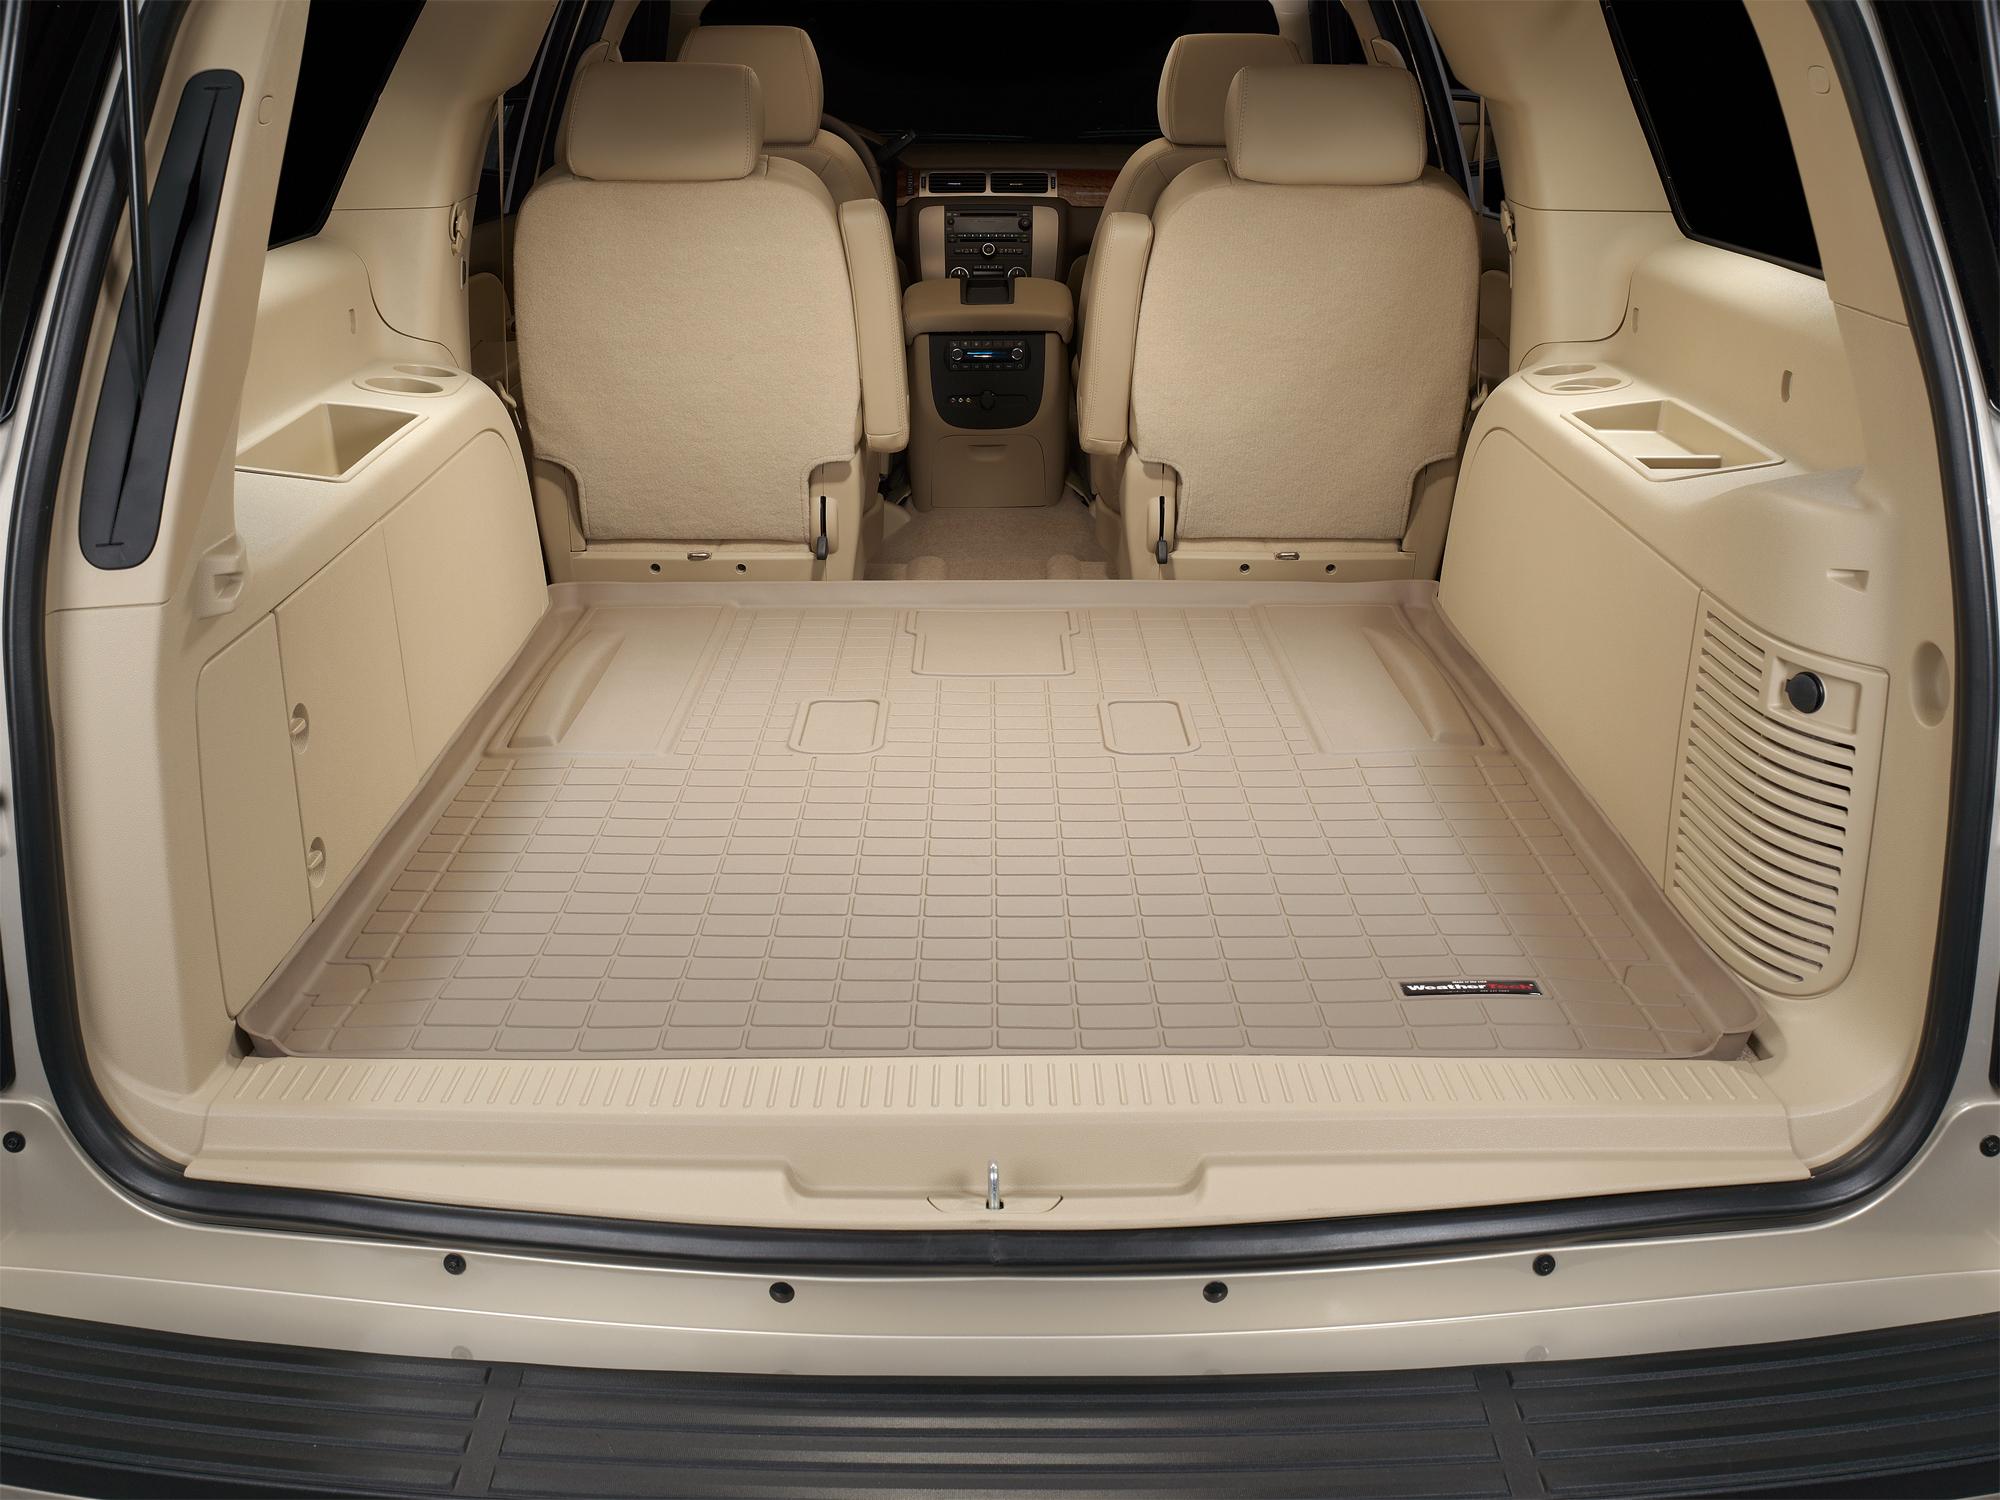 Cadillac Escalade ESV 2007>2014 Vasca baule tappeto bagagliaio marrone *290